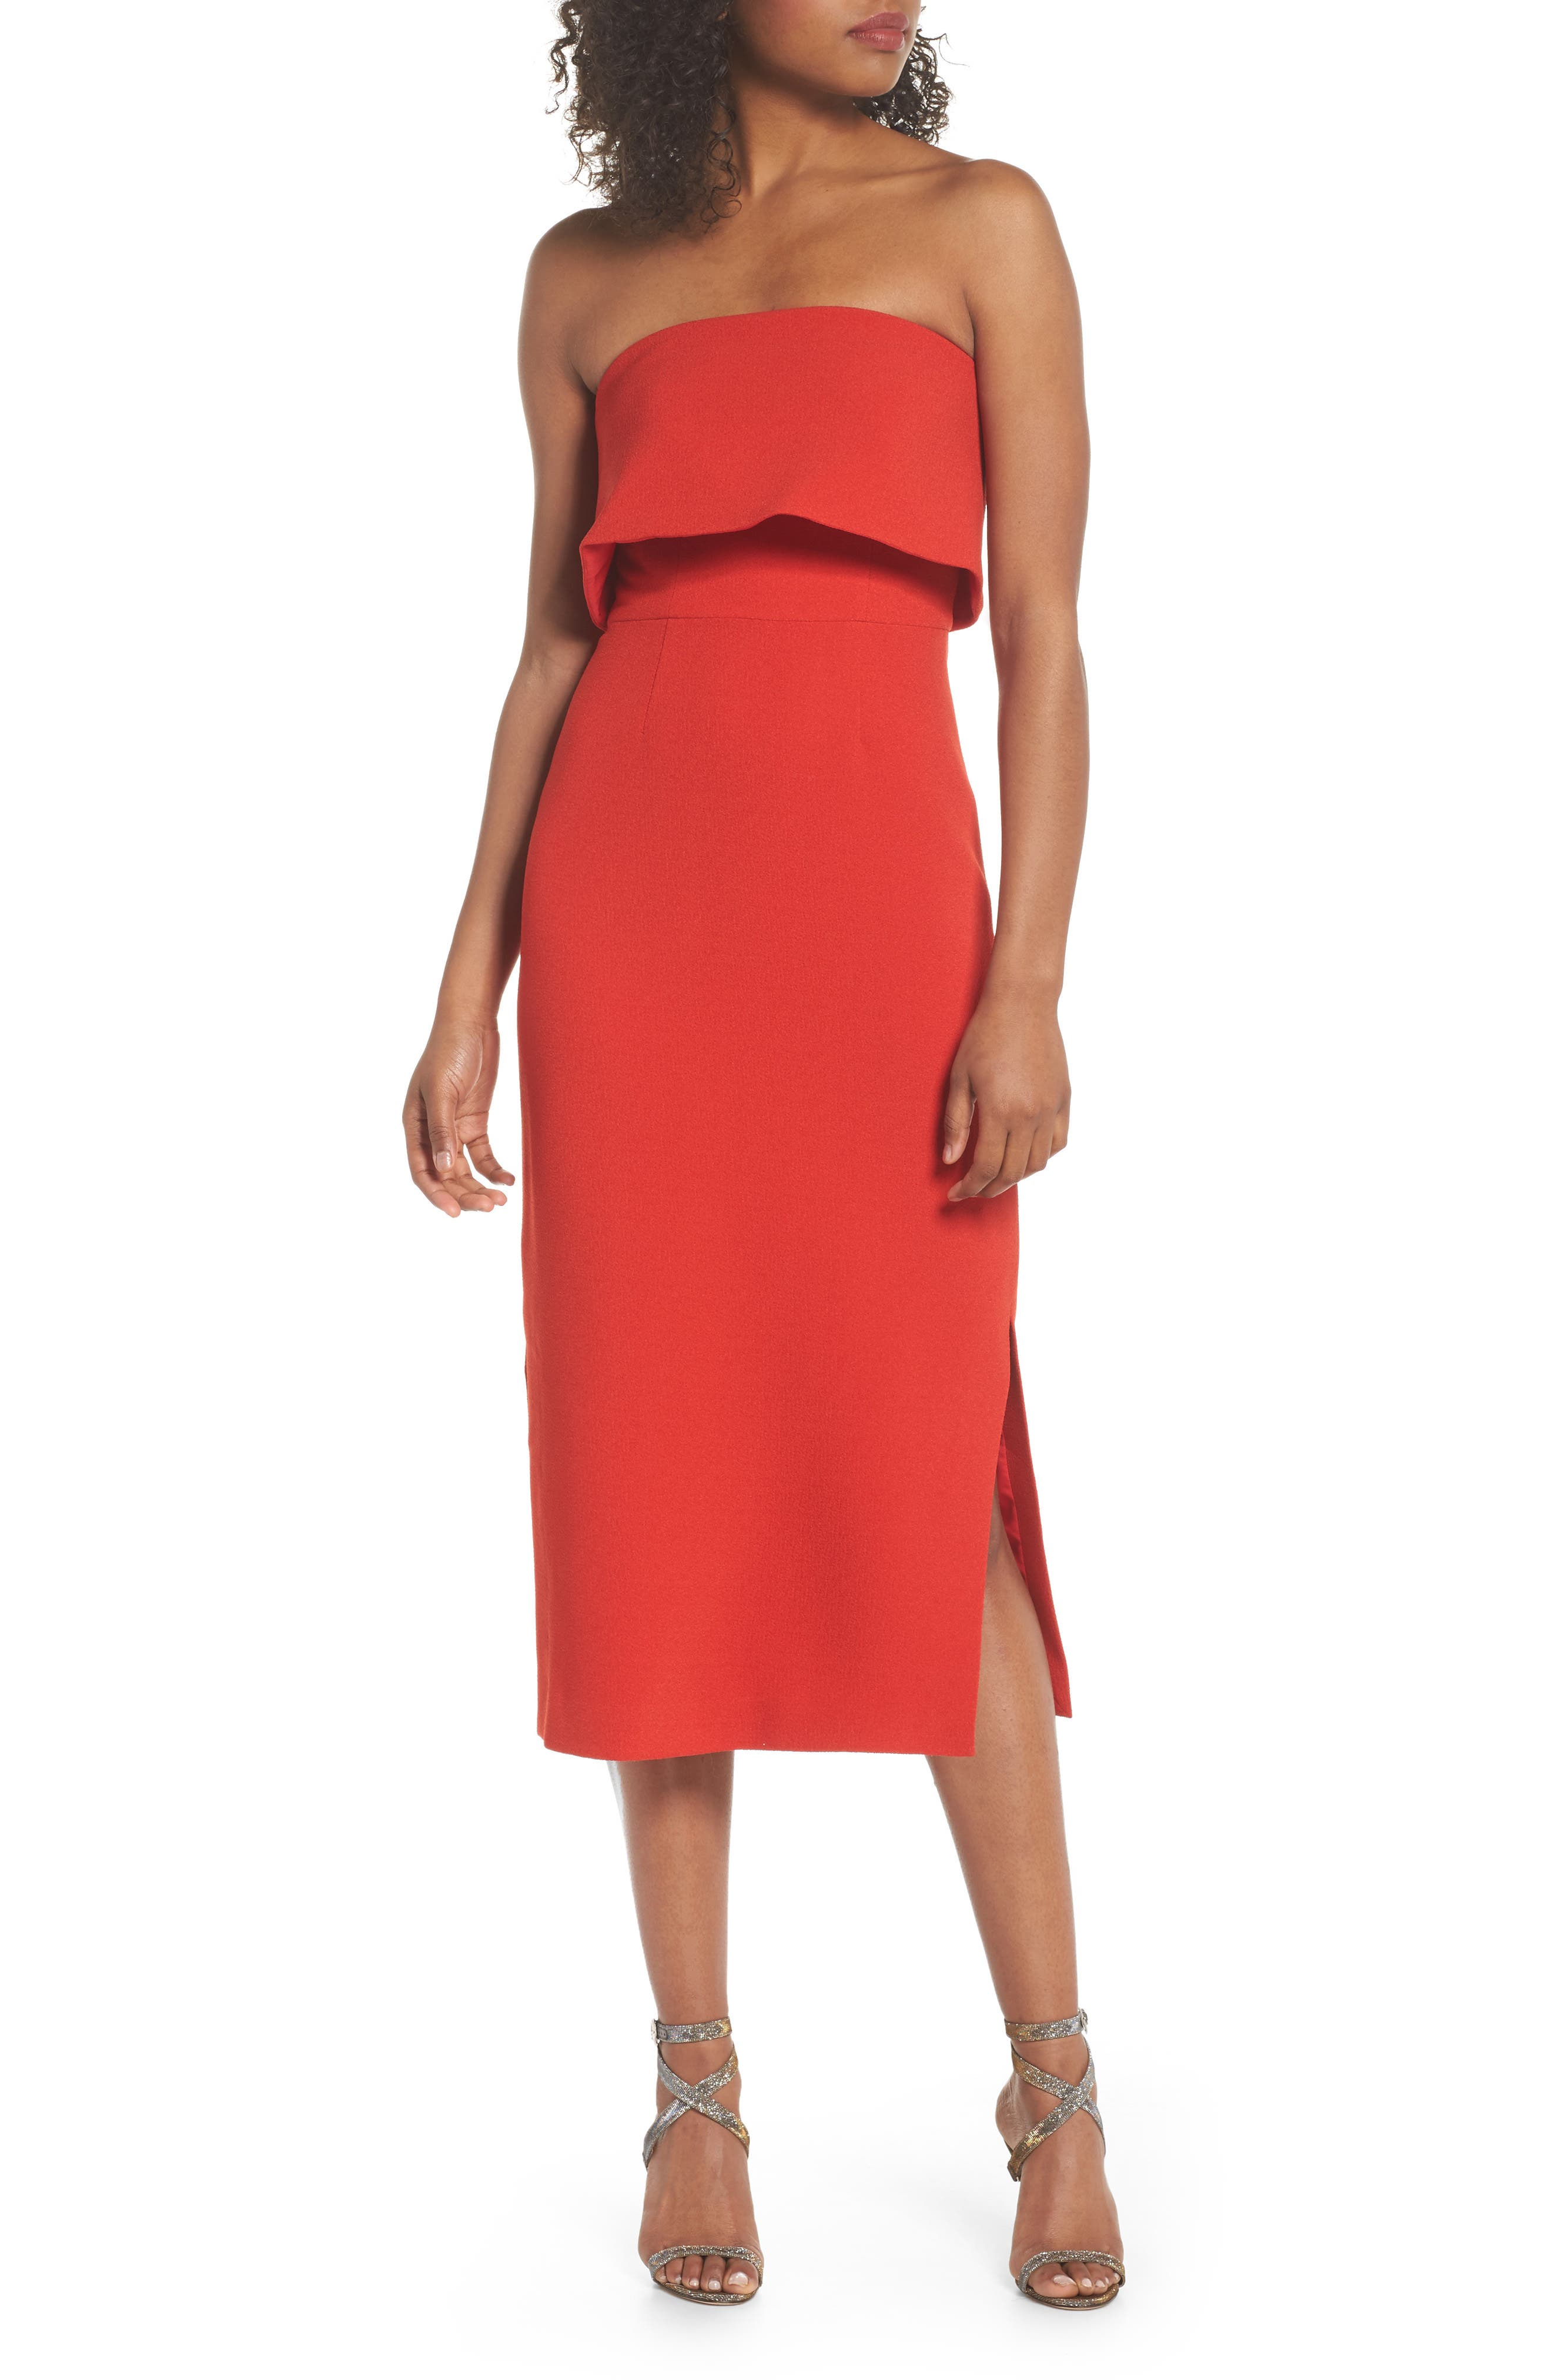 Entice Strapless Midi Dress,                             Main thumbnail 1, color,